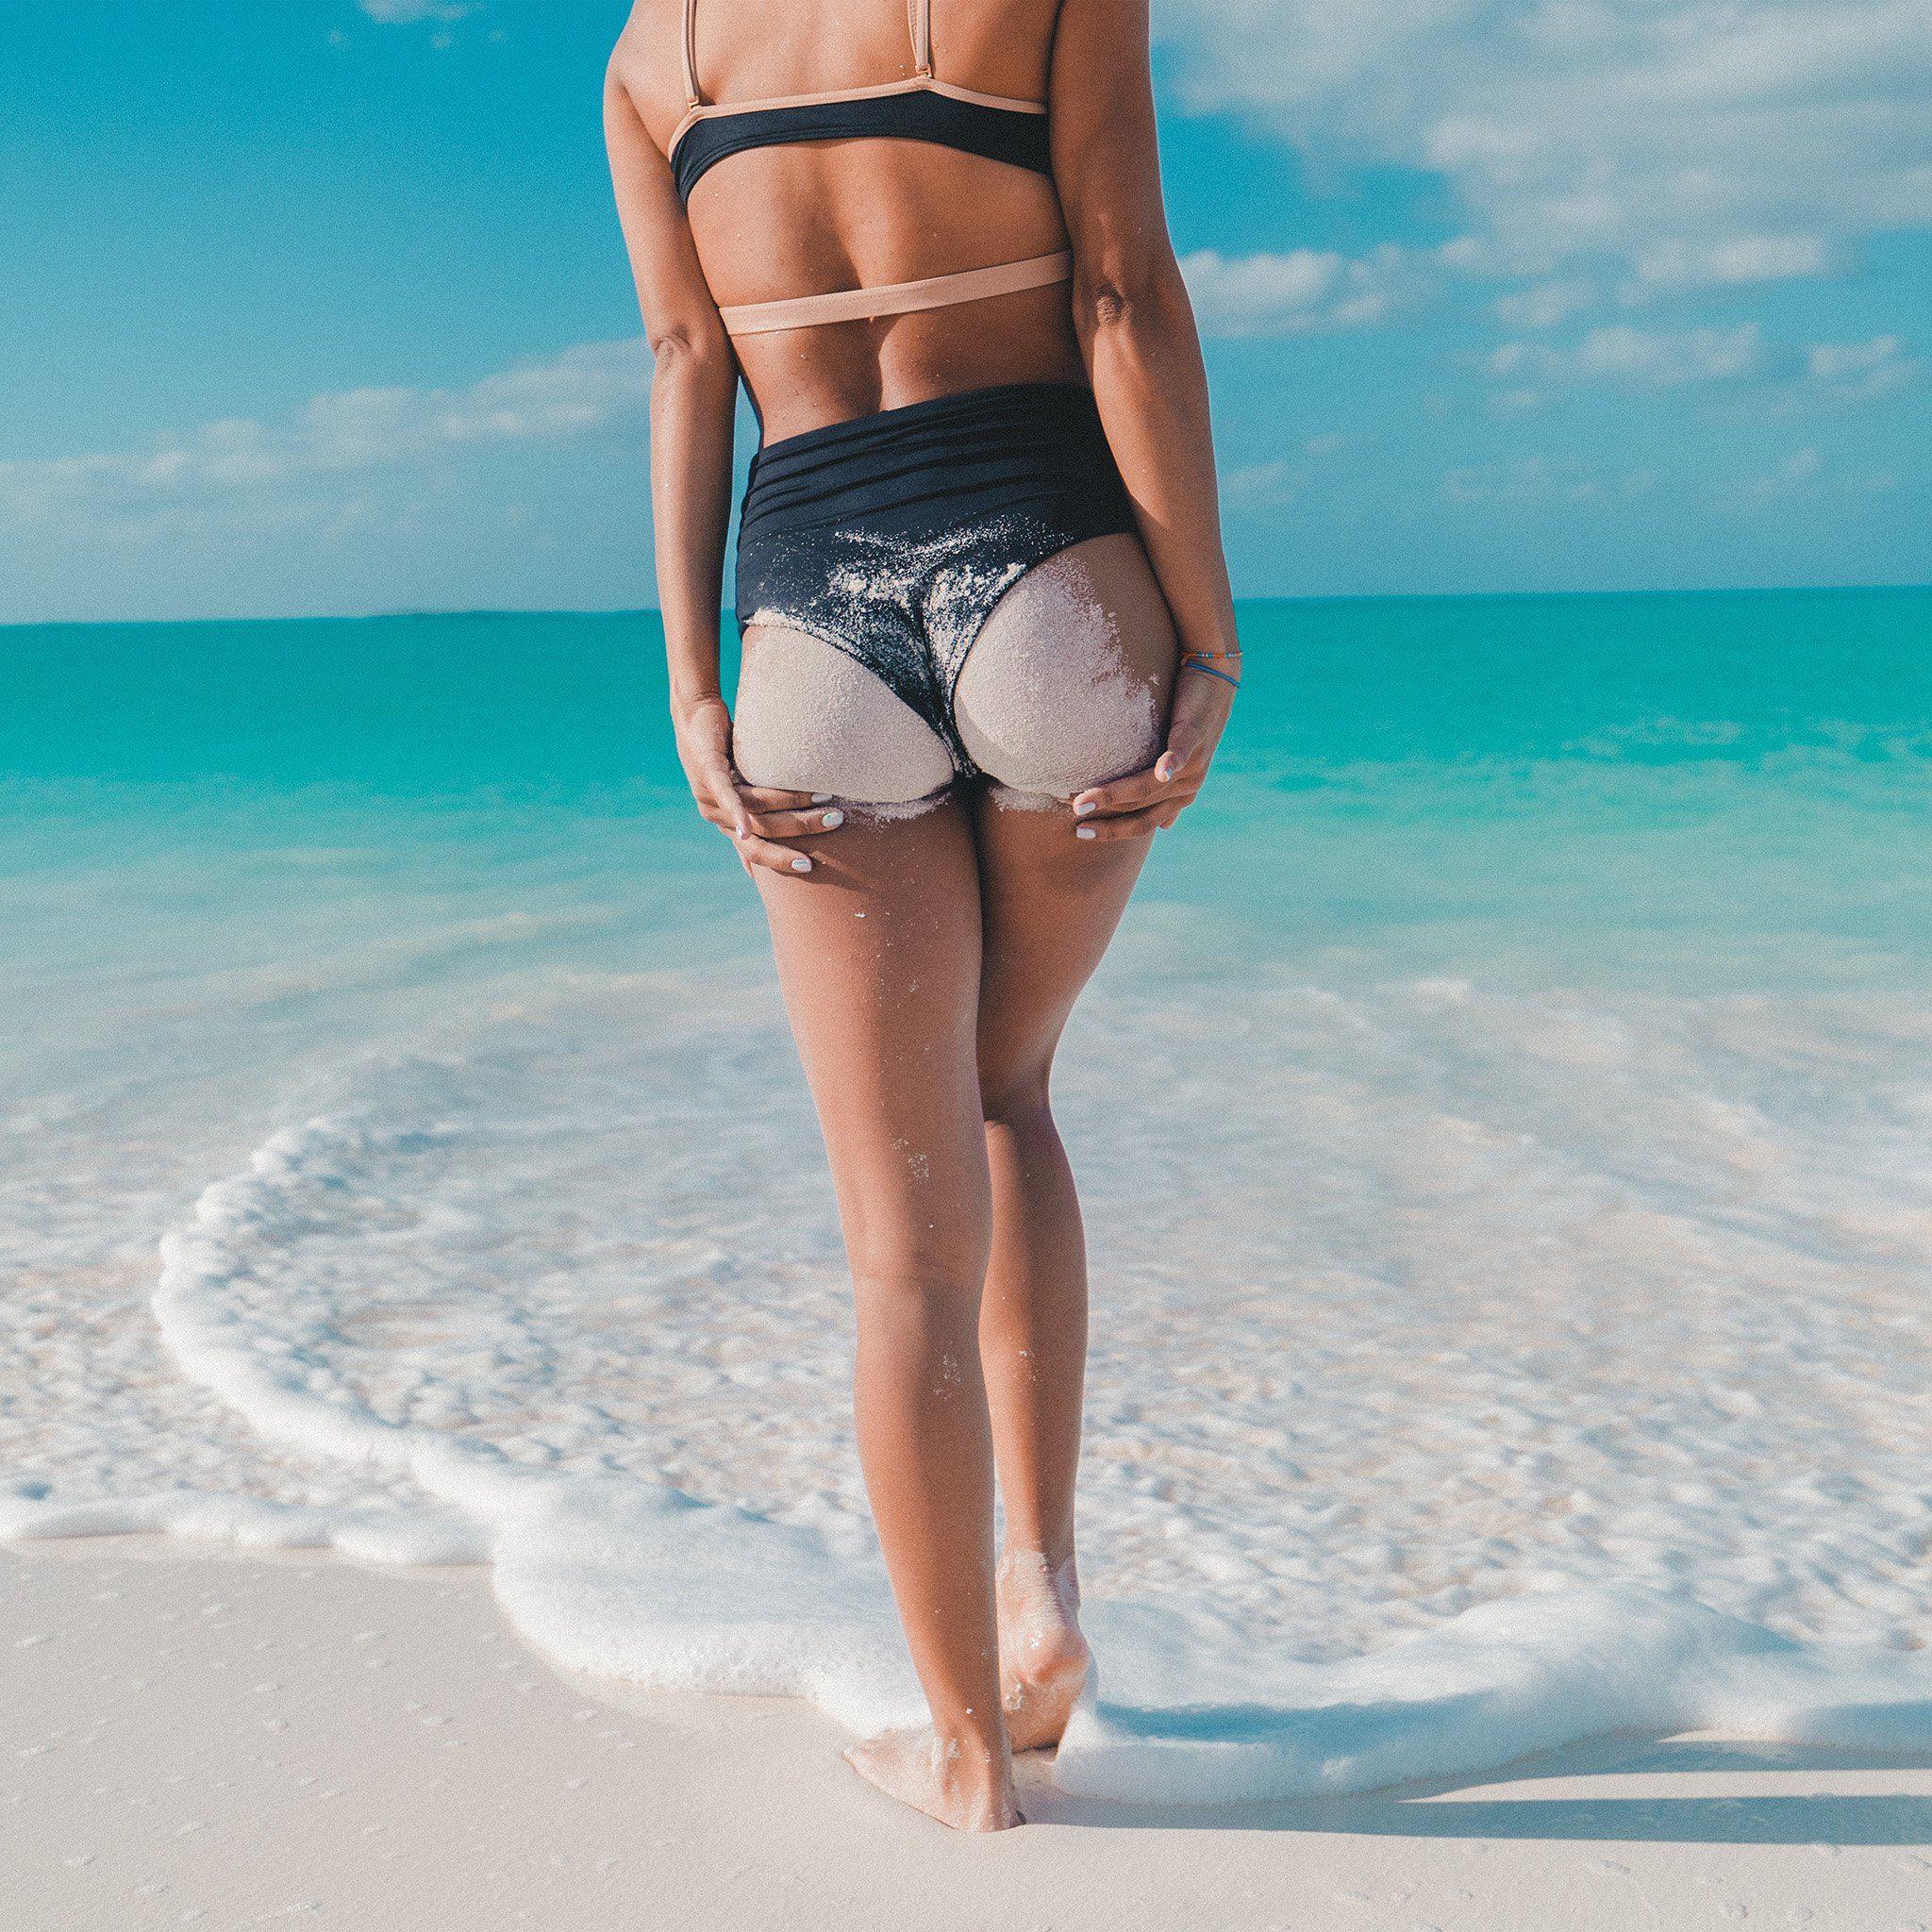 Summer beach girl vacation iPad Air wallpaper